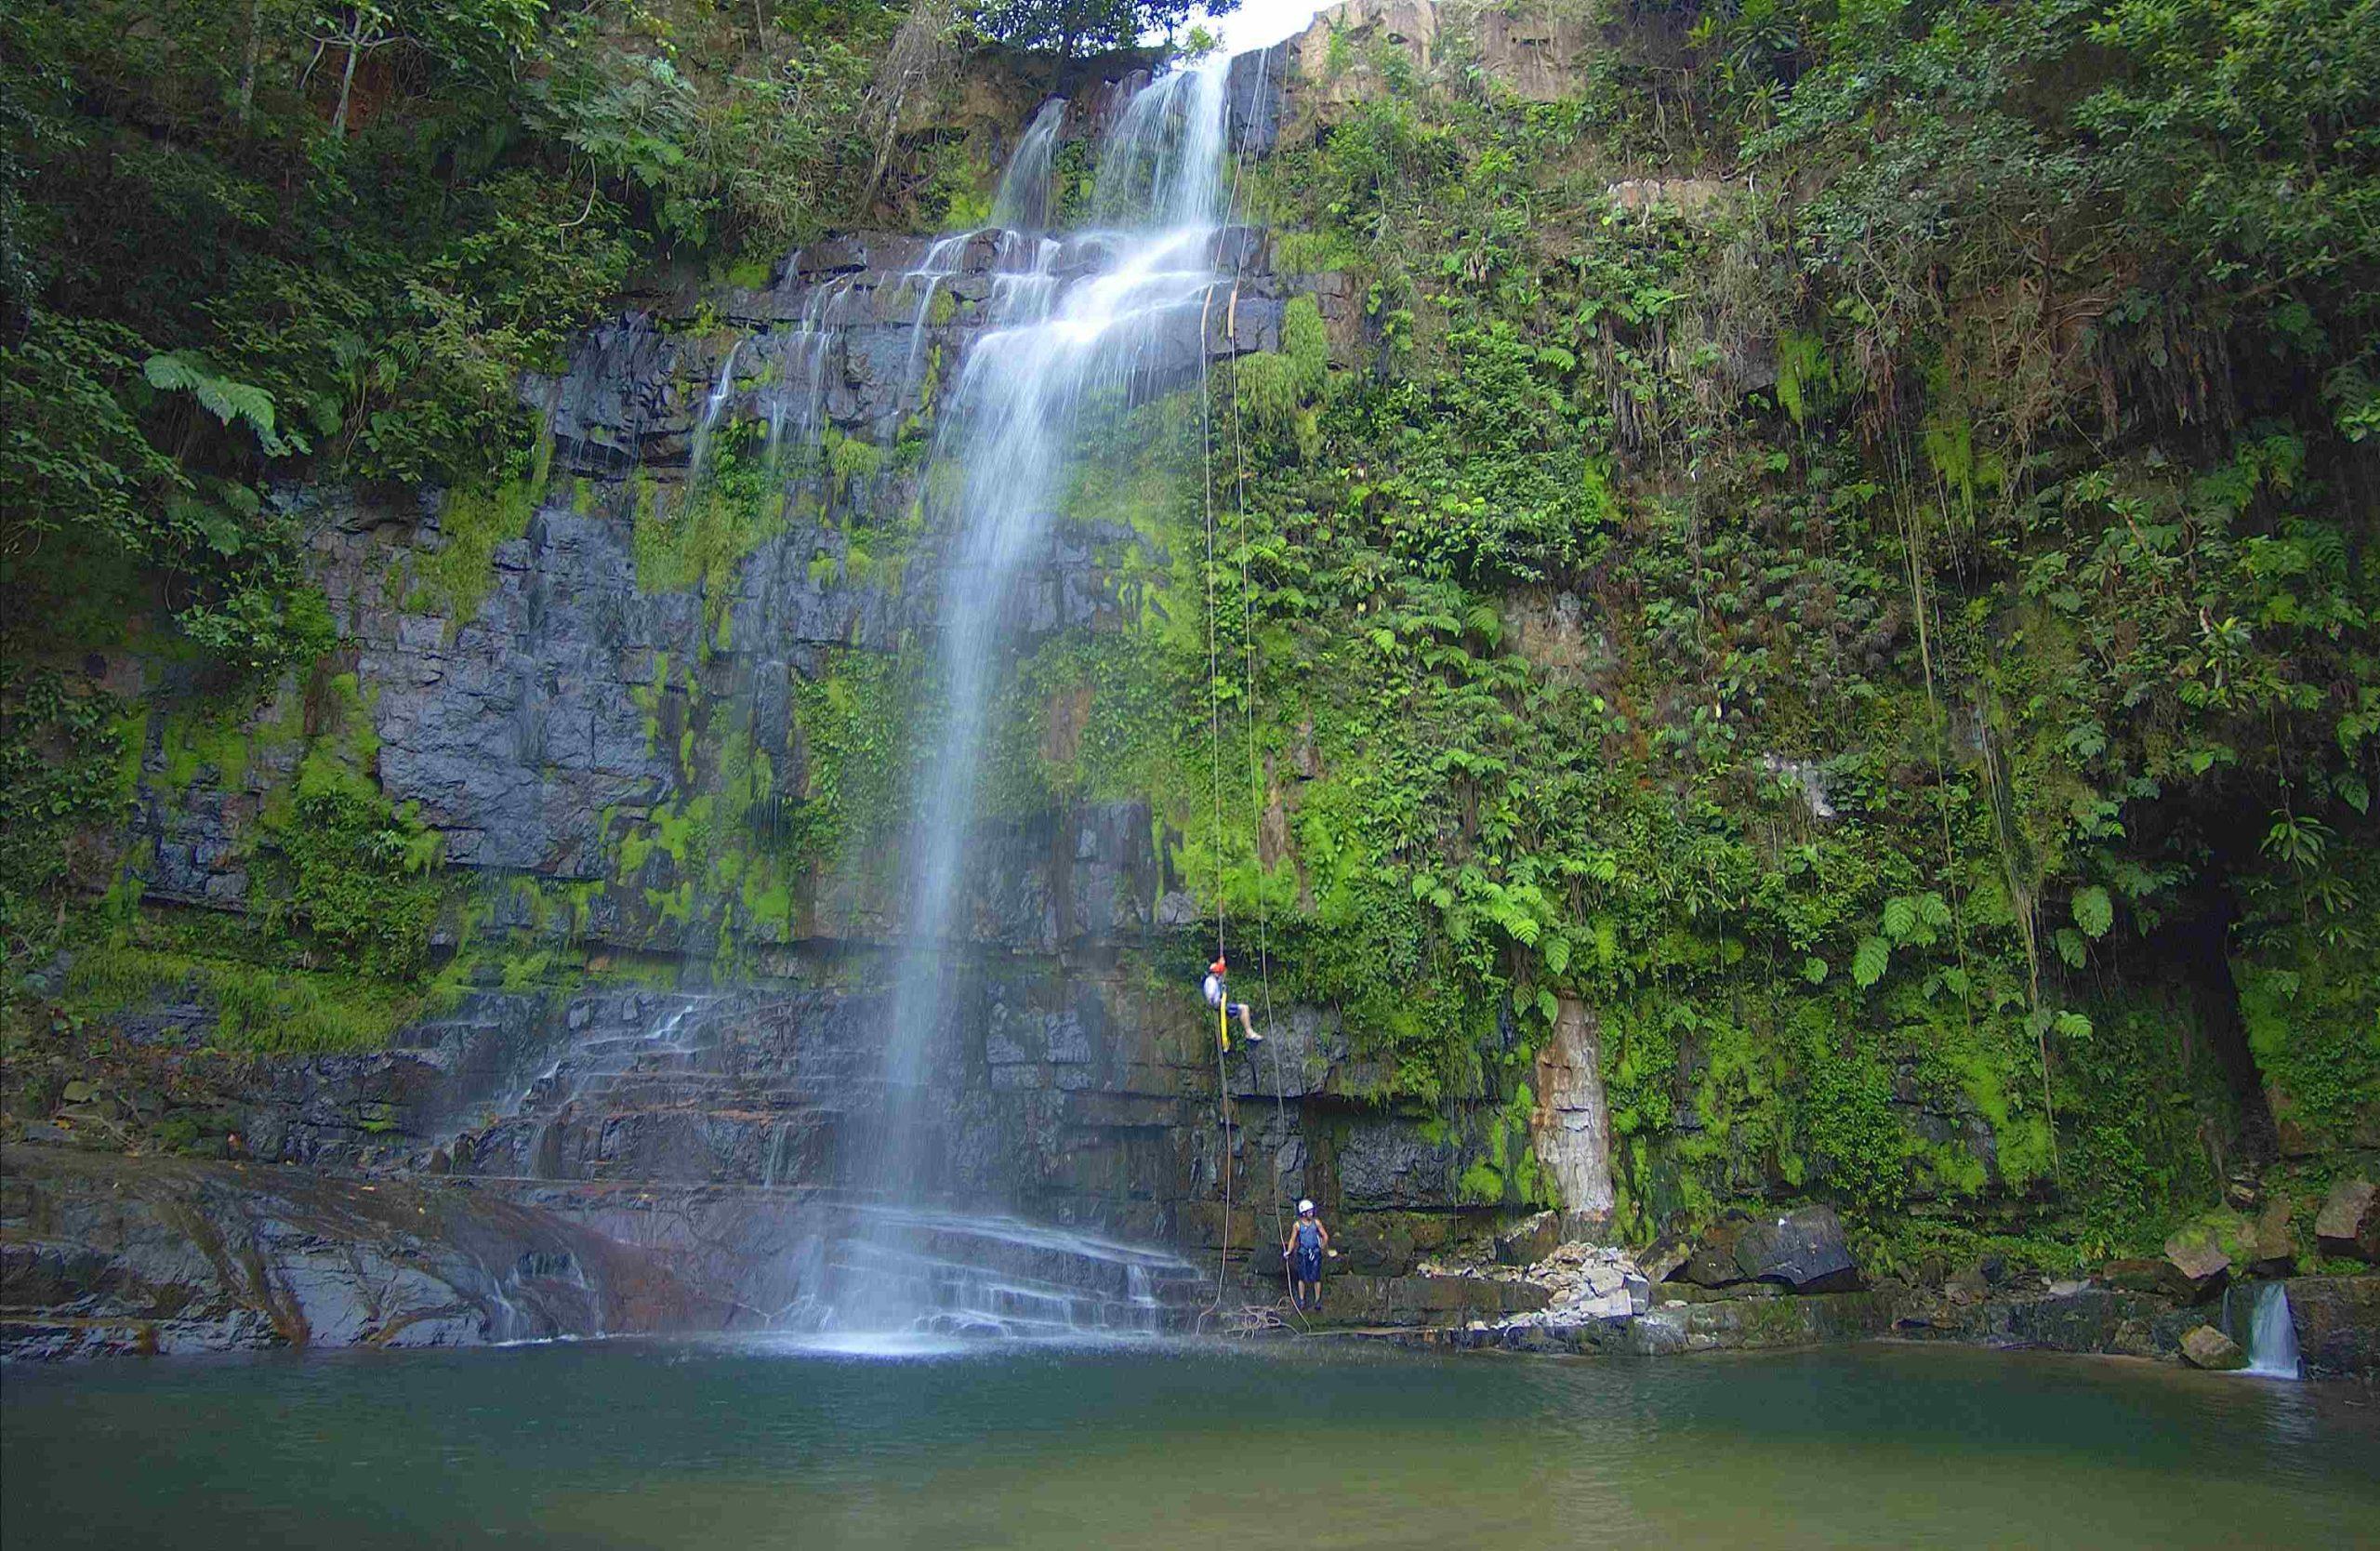 Parque Estadual da Serra Azul - Cachoeira